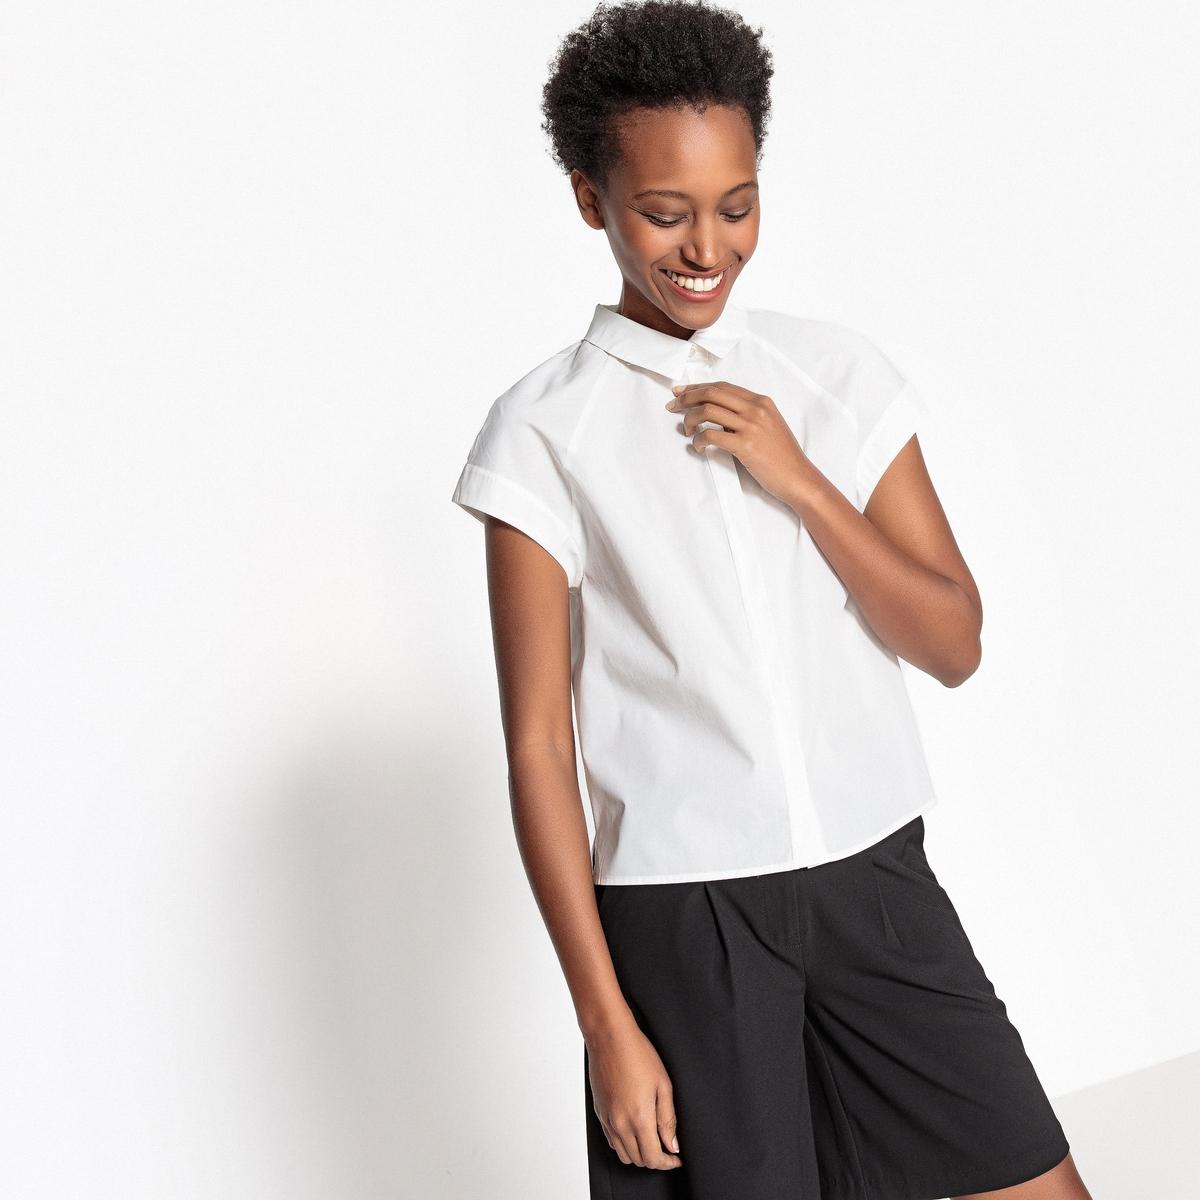 Фото - Рубашка прямого покроя с короткими рукавами из поплина рубашка однотонная прямого покроя с короткими рукавами 100% лен